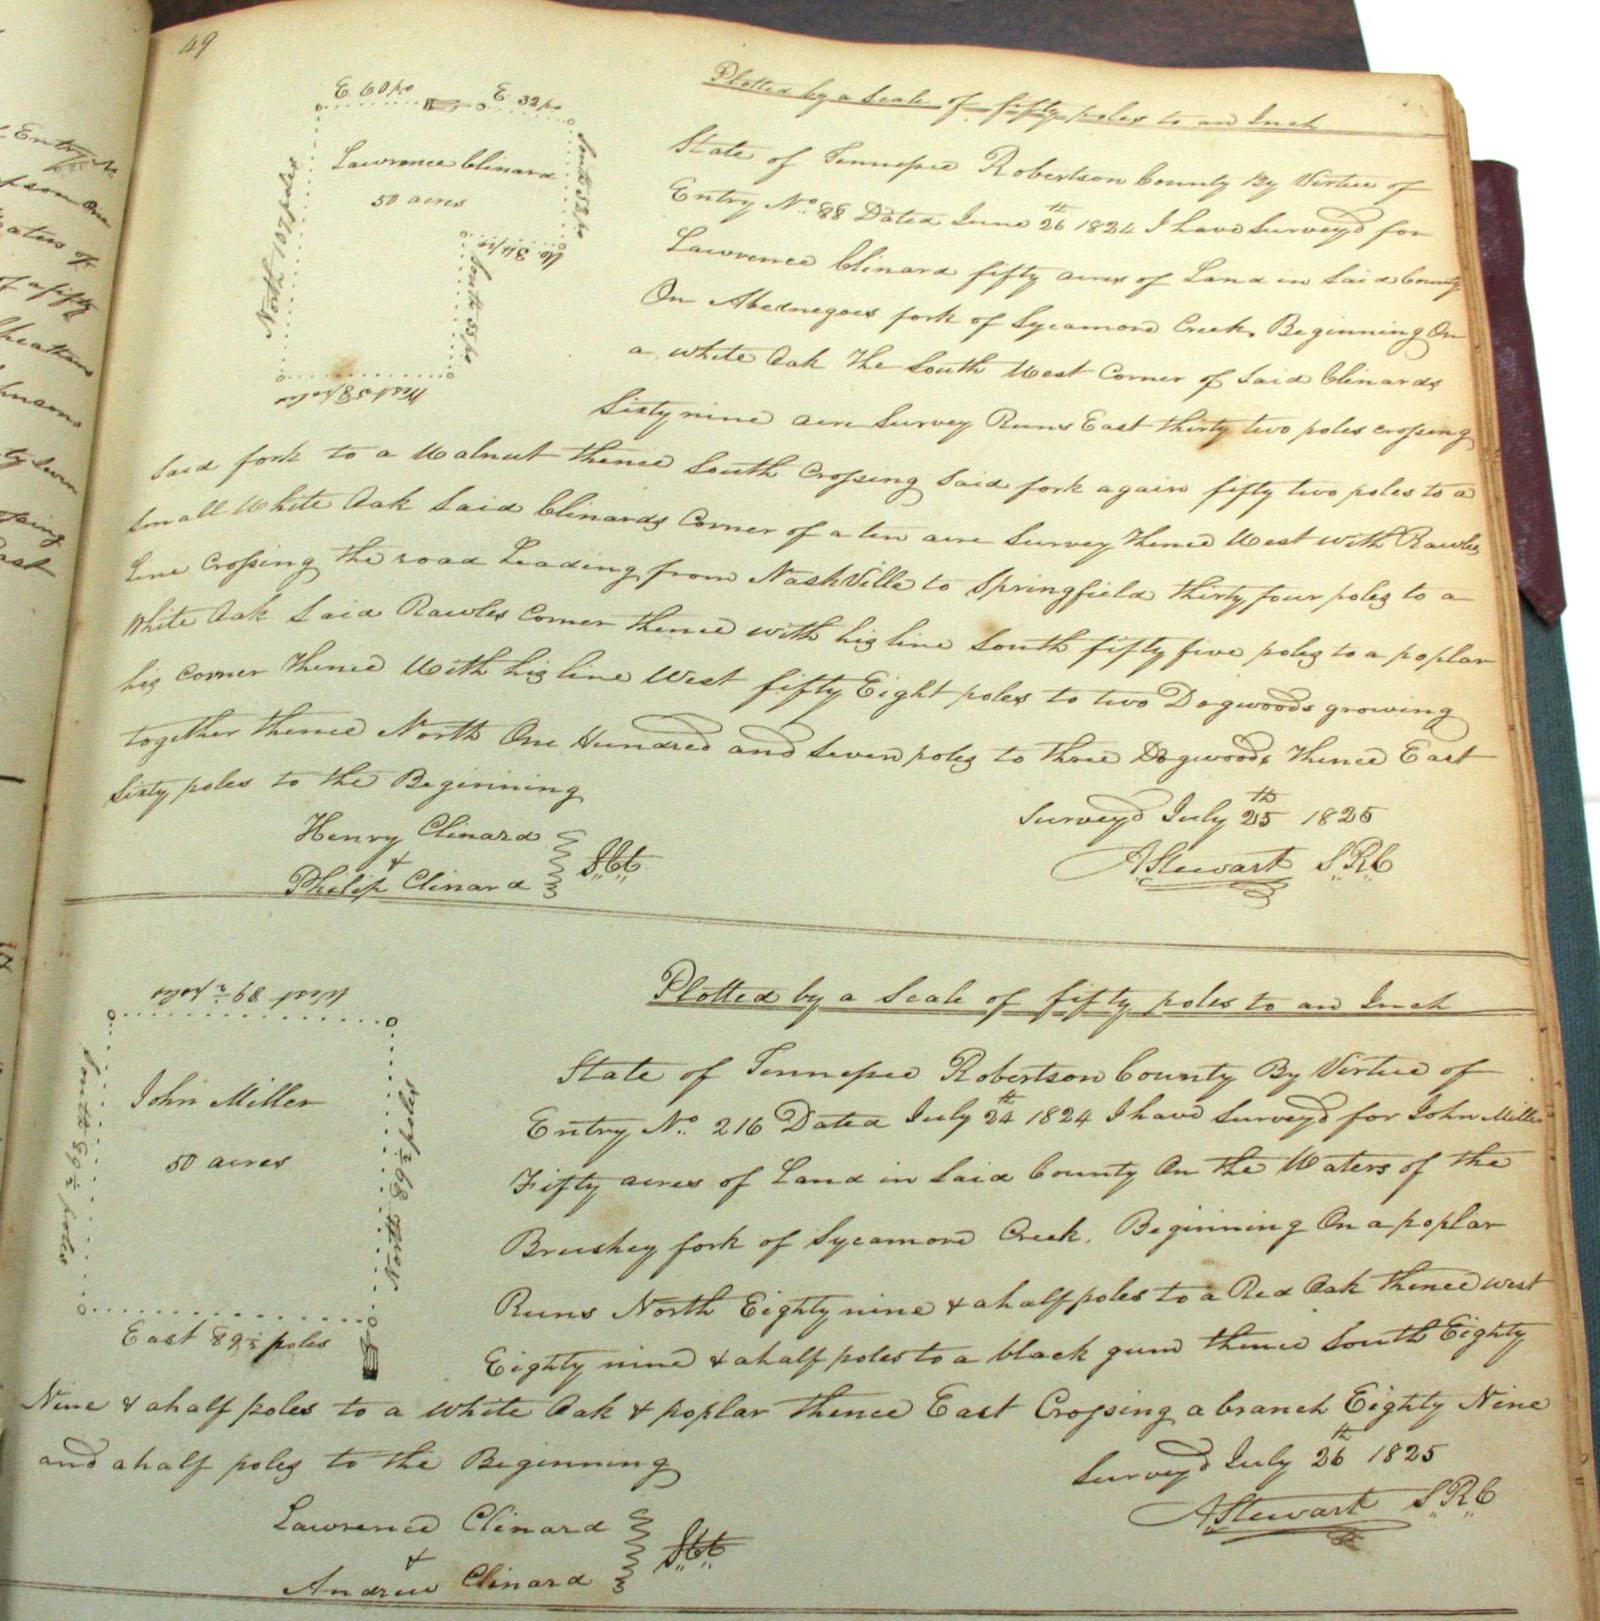 Tennessee robertson county springfield - Clinard Lawrence Miller John 1825 2 Surveys